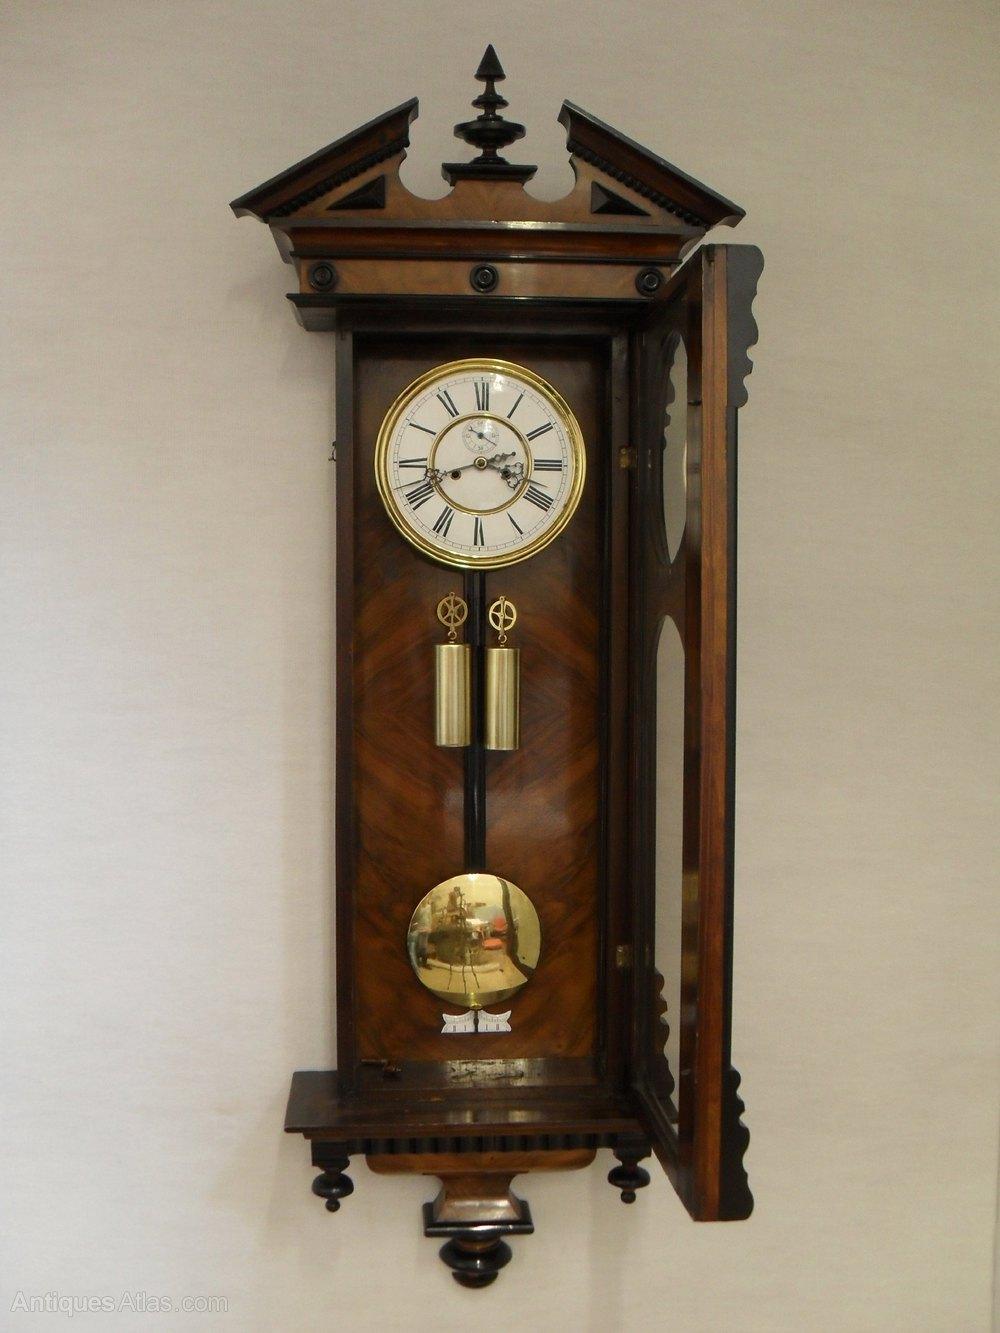 Antiques Atlas Vienna Wall Clock